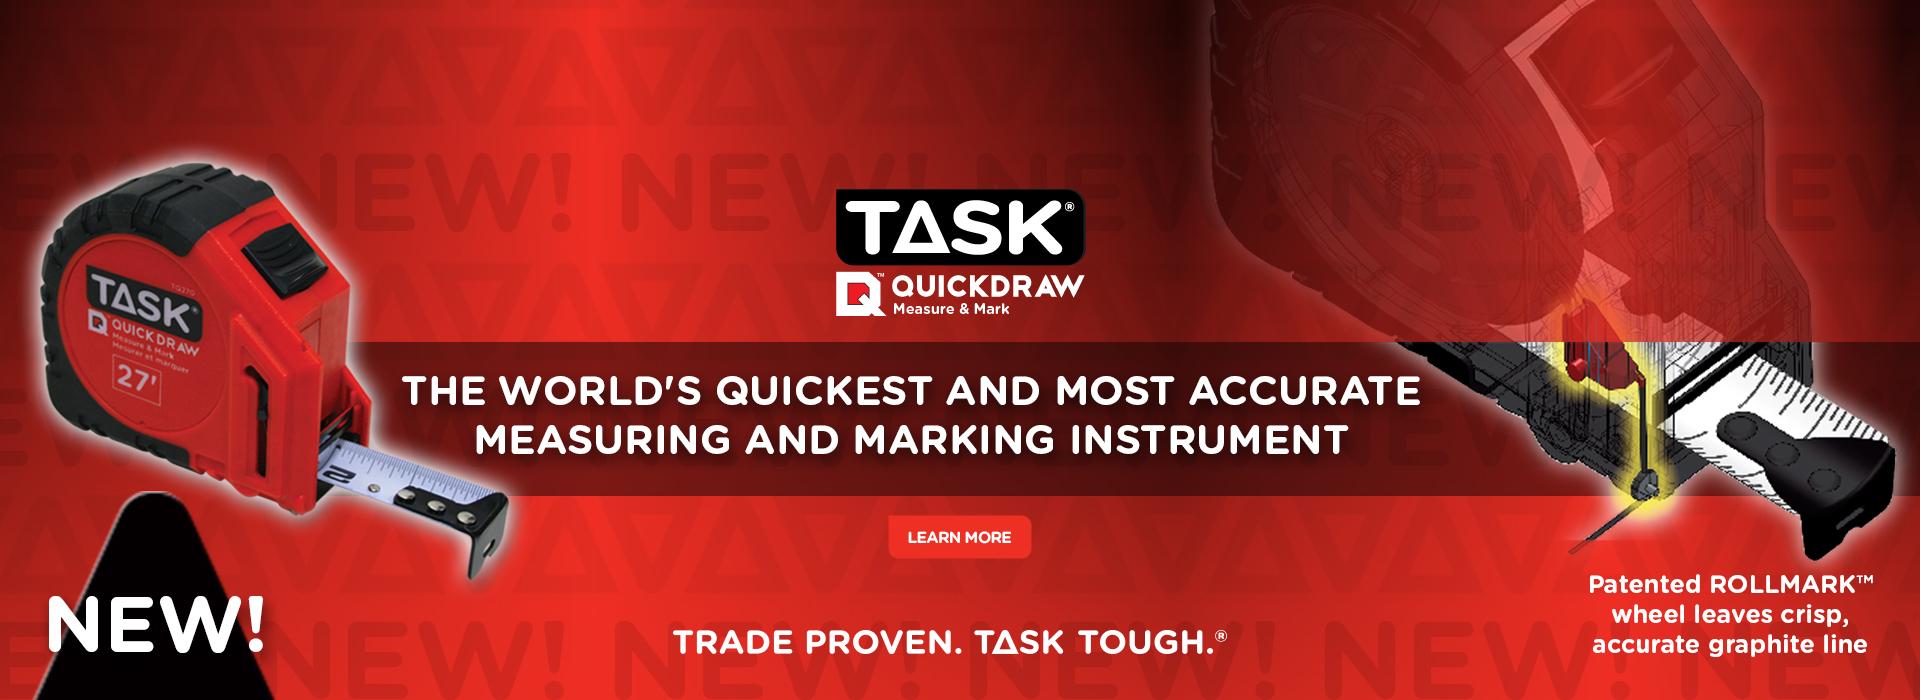 TASK Quickdraw